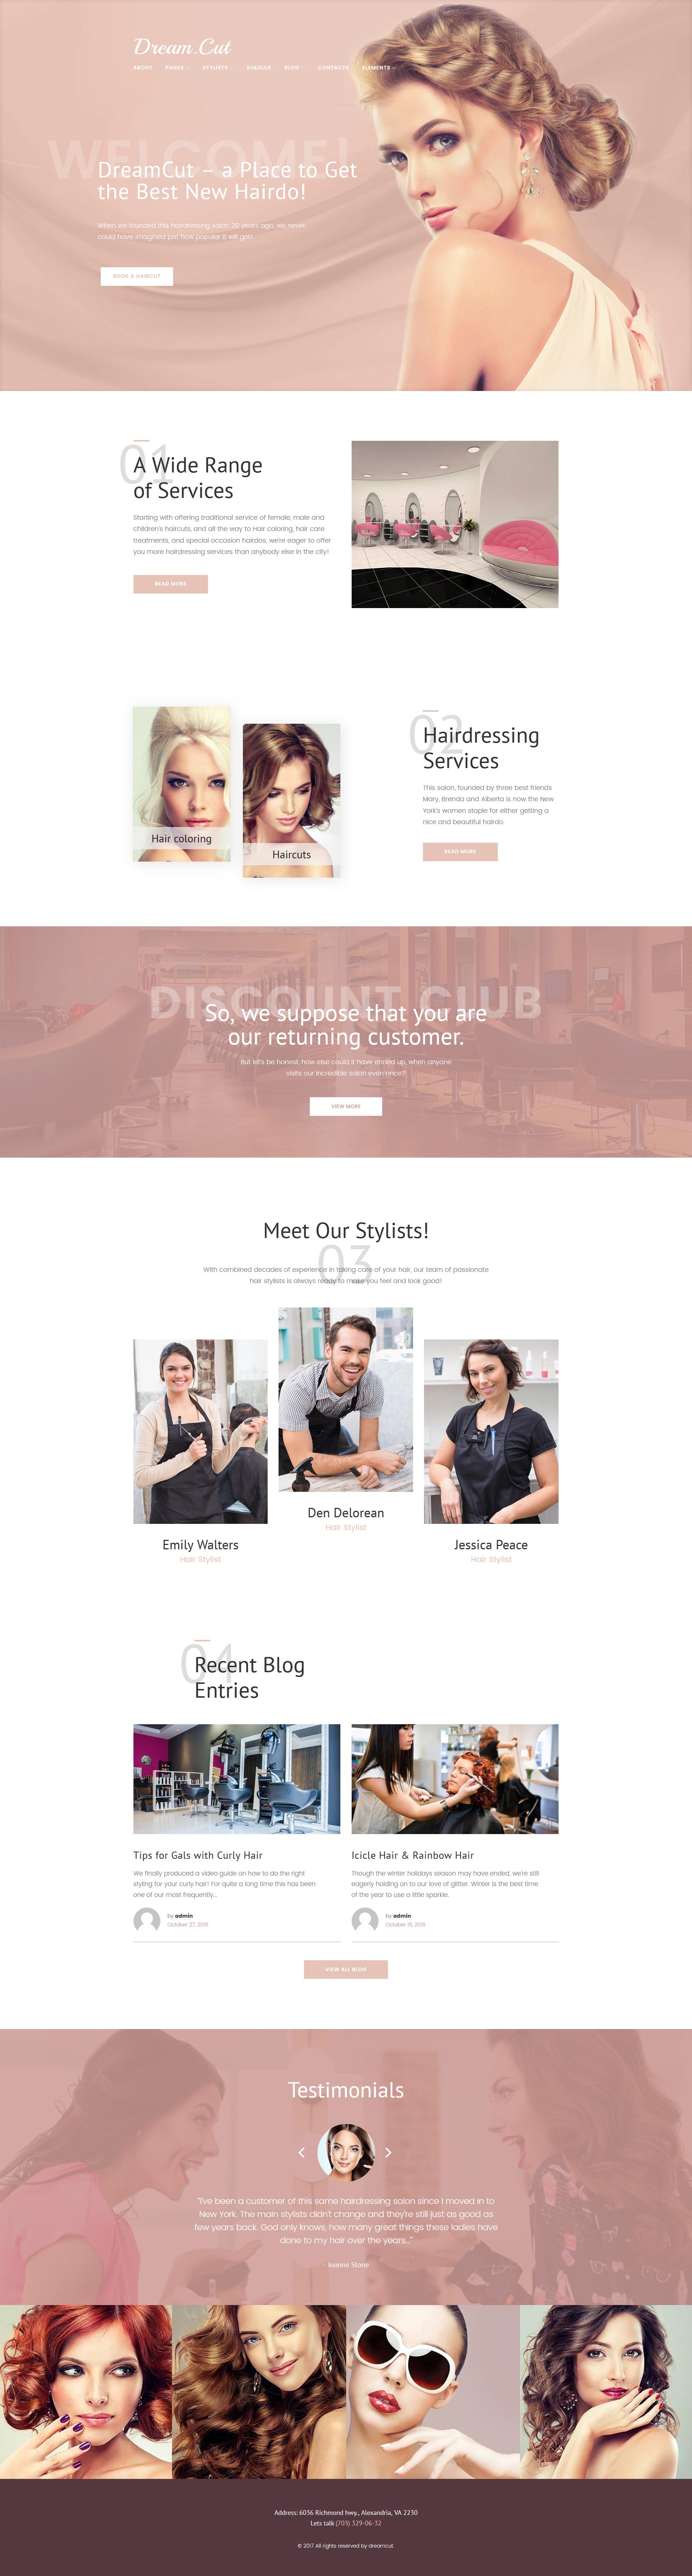 Responsive DreamCut Wordpress #64062